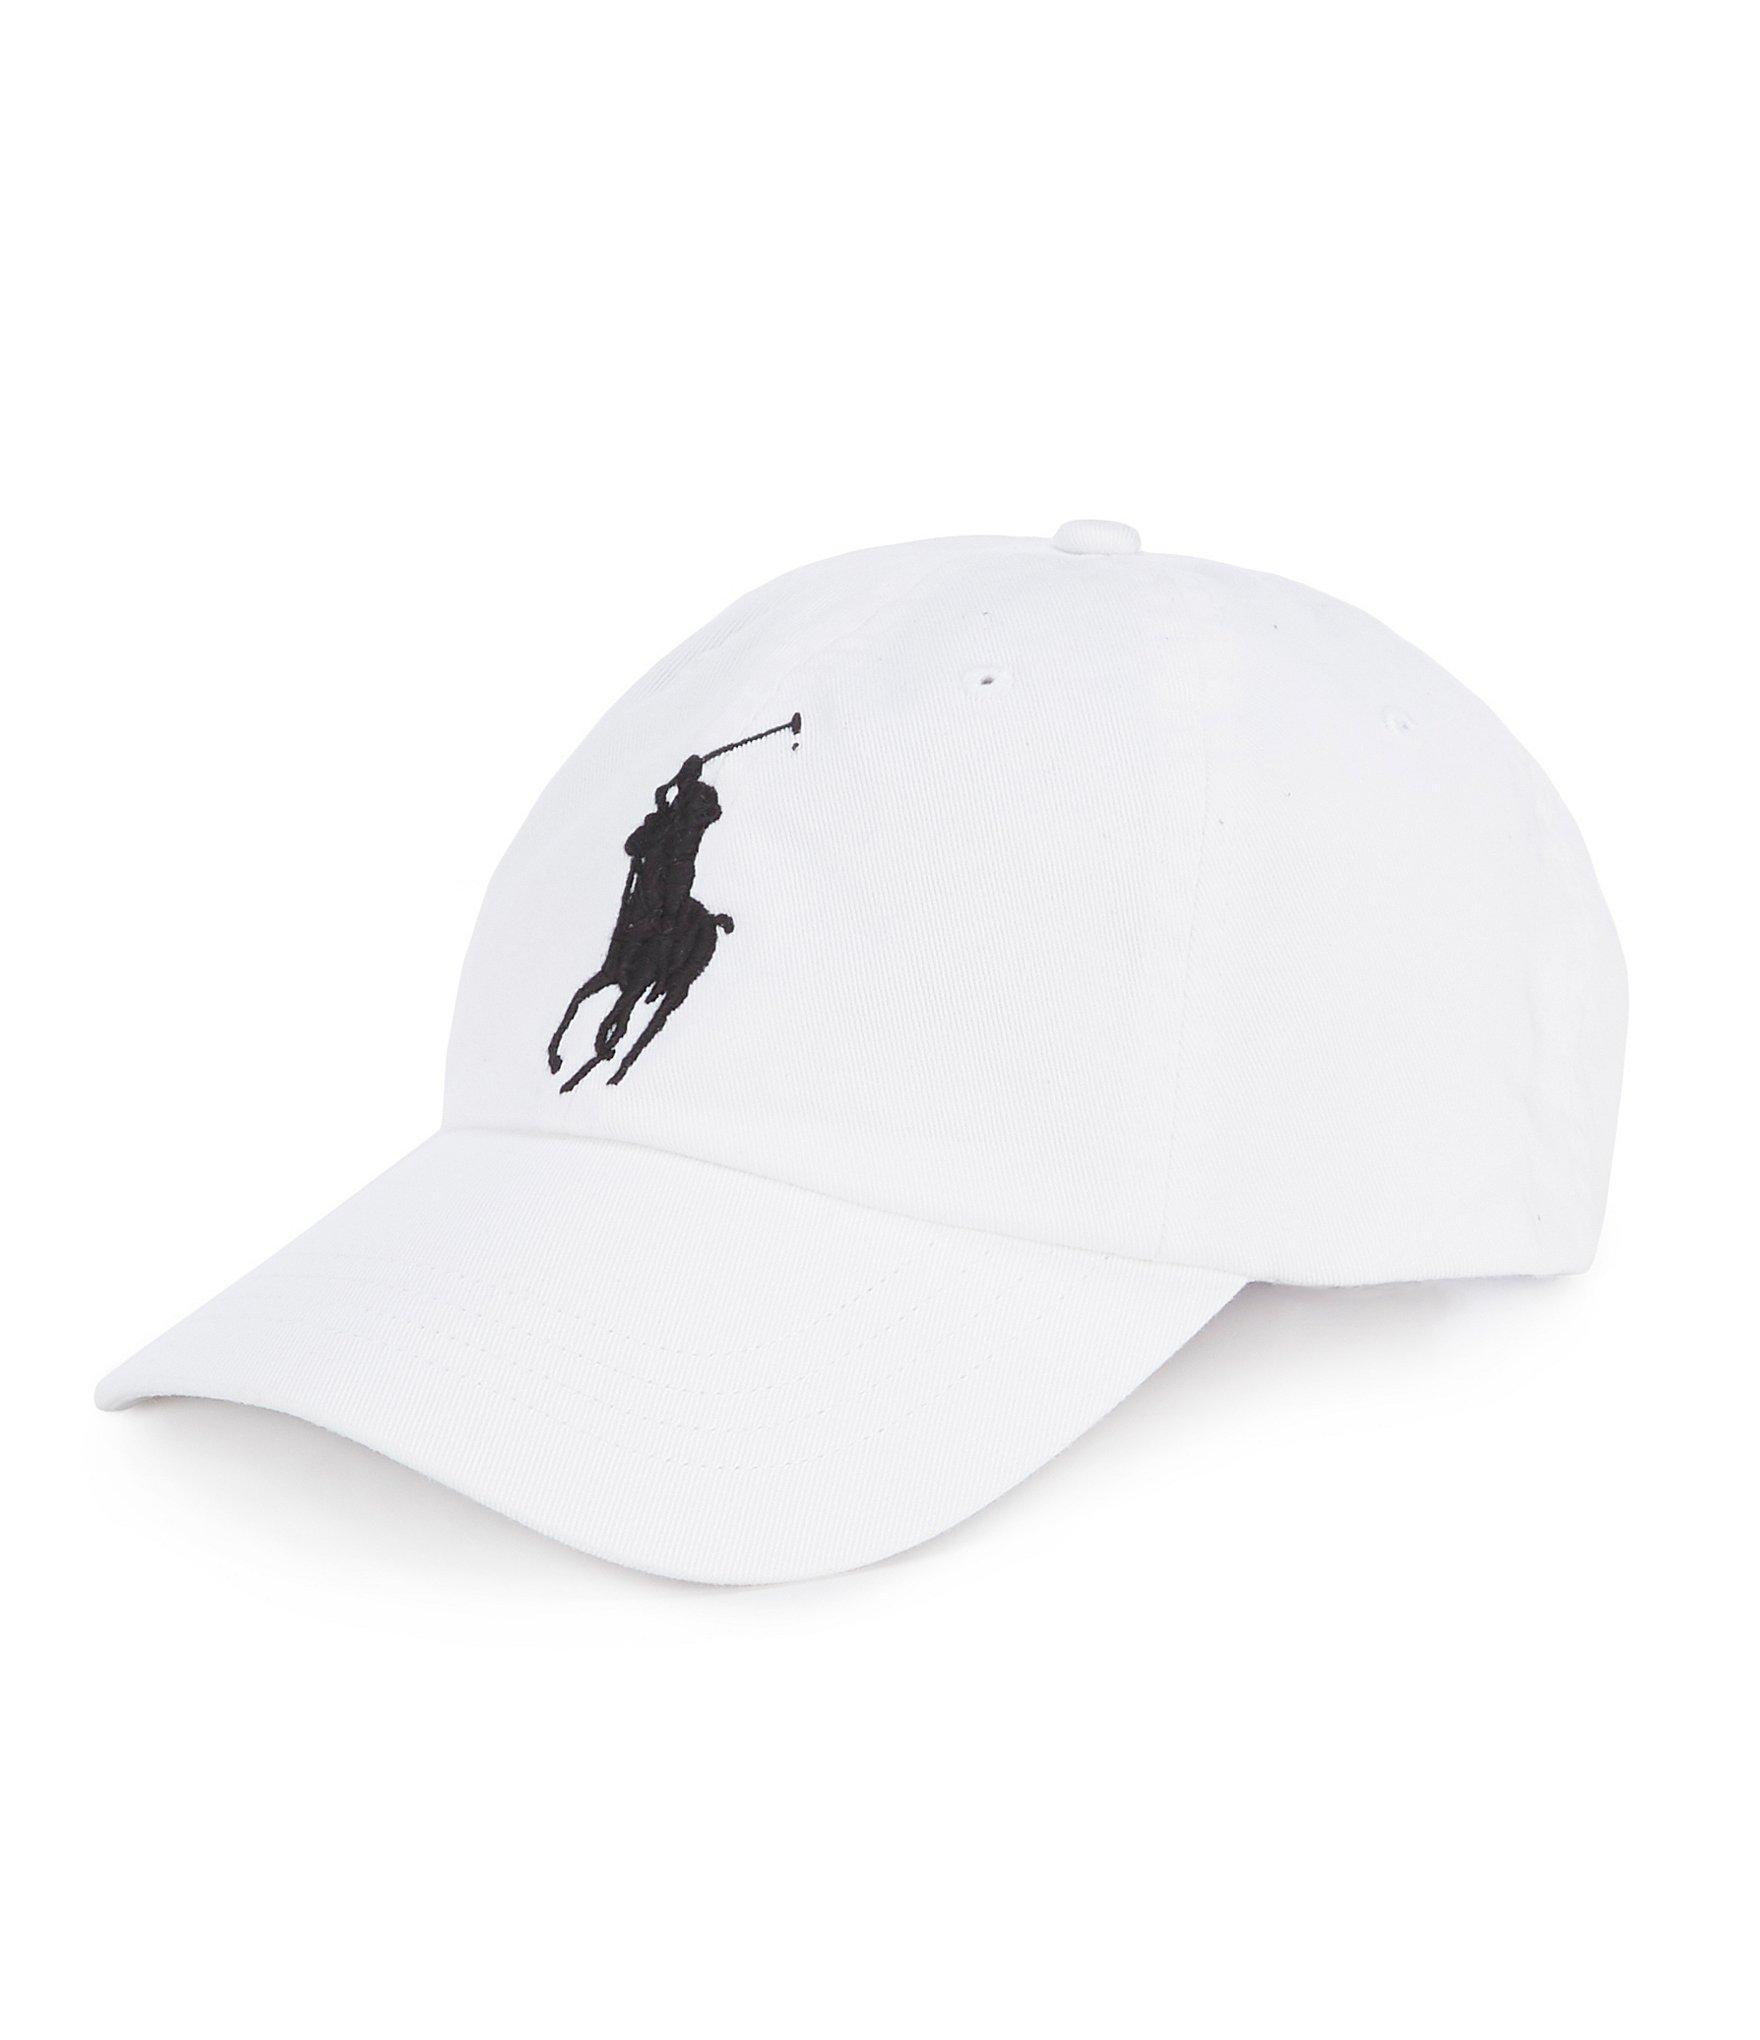 afc69249 Lyst - Polo Ralph Lauren Cotton Chino Baseball Cap in White for Men ...